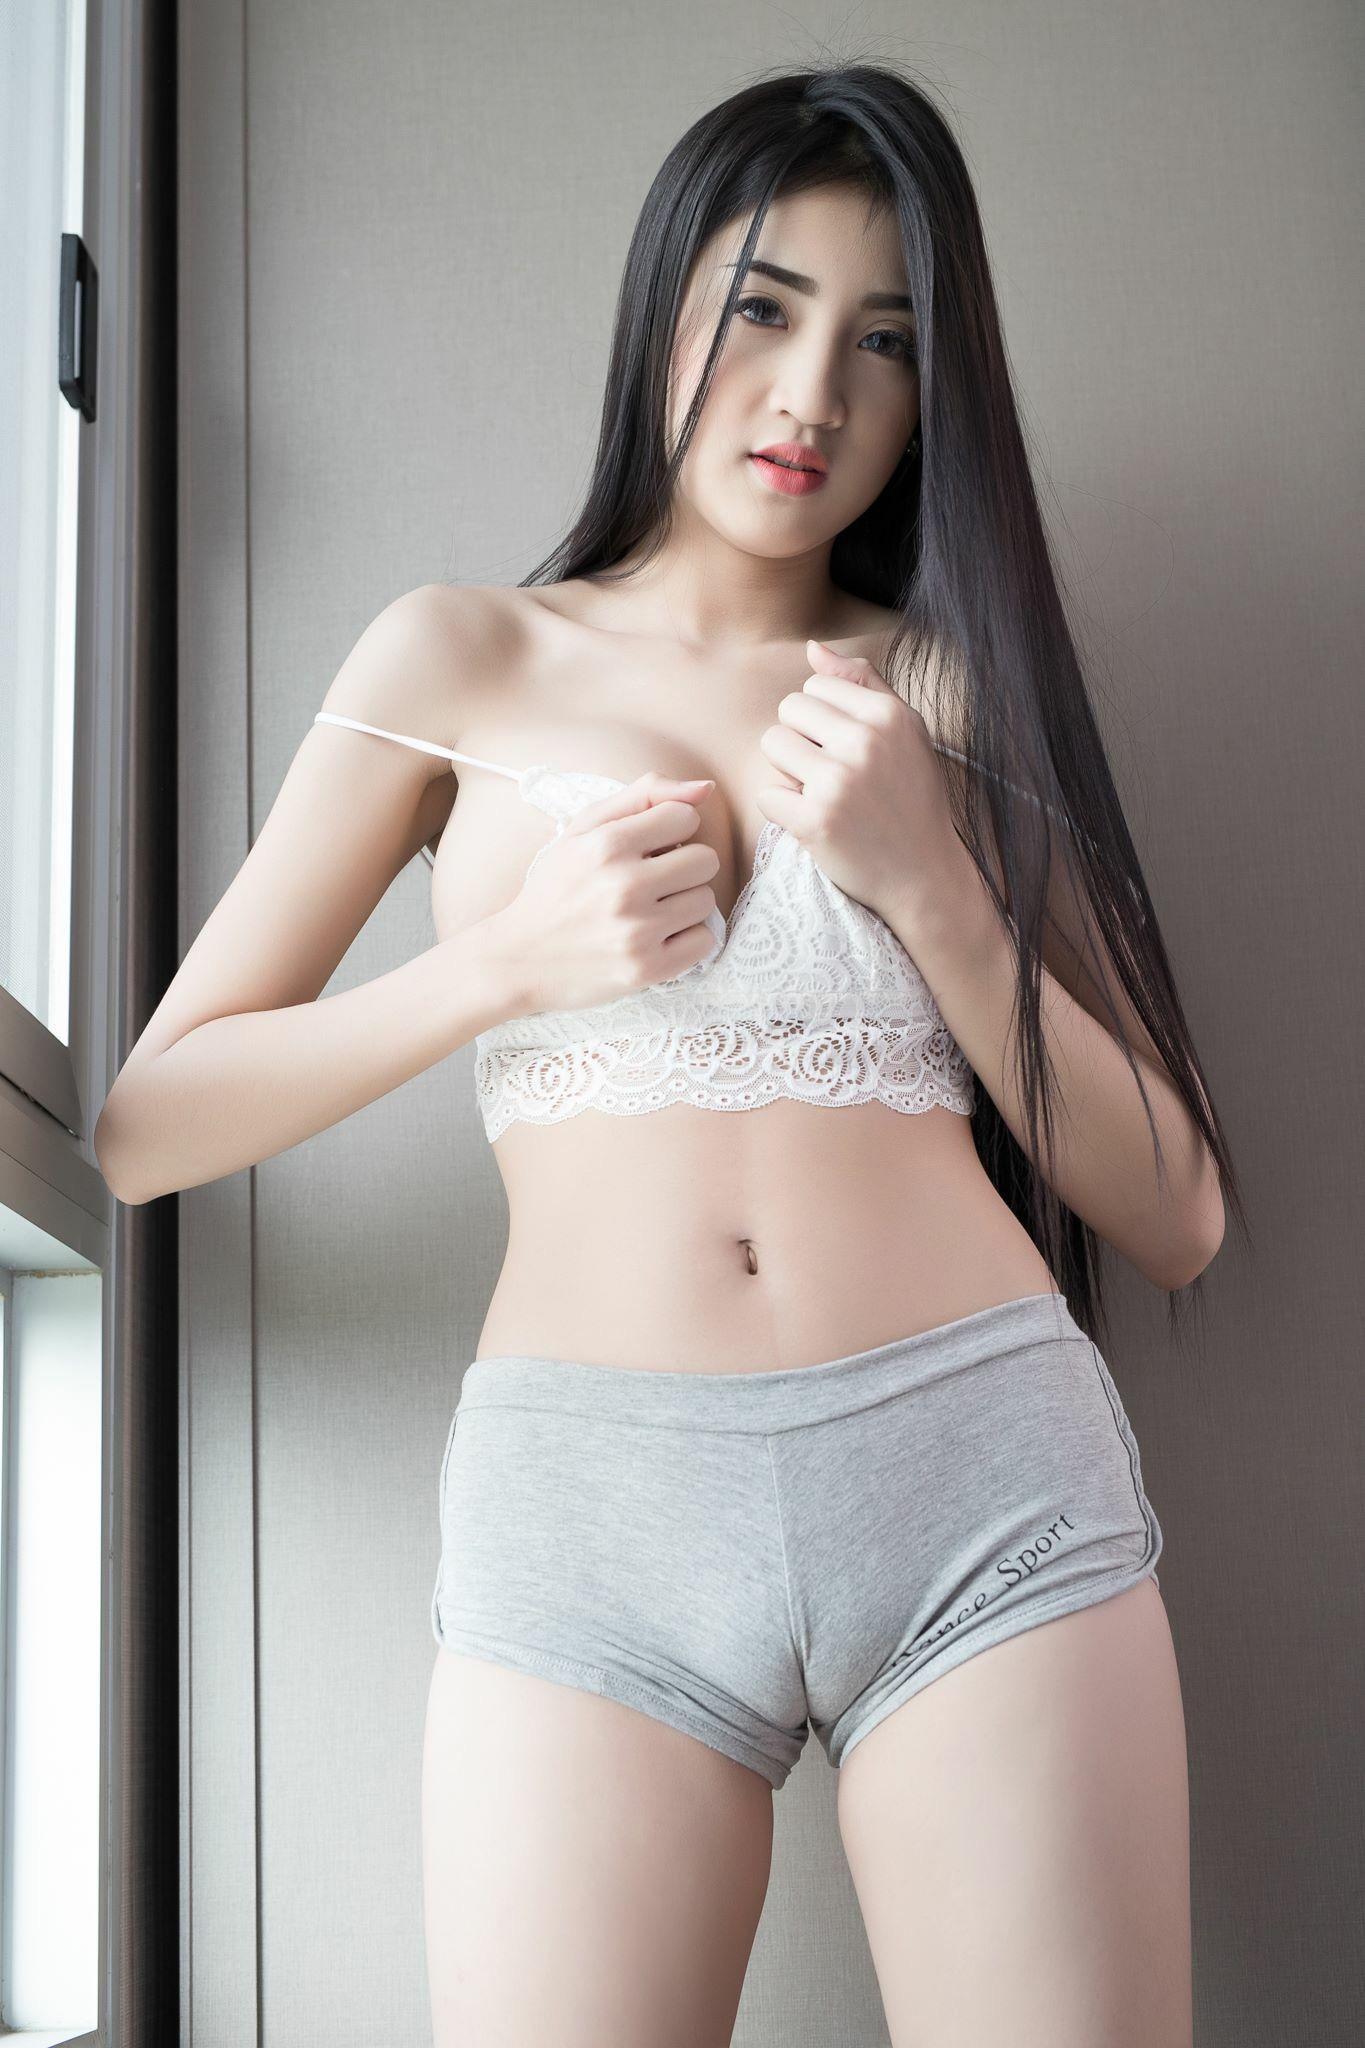 Asian girl pts louisville